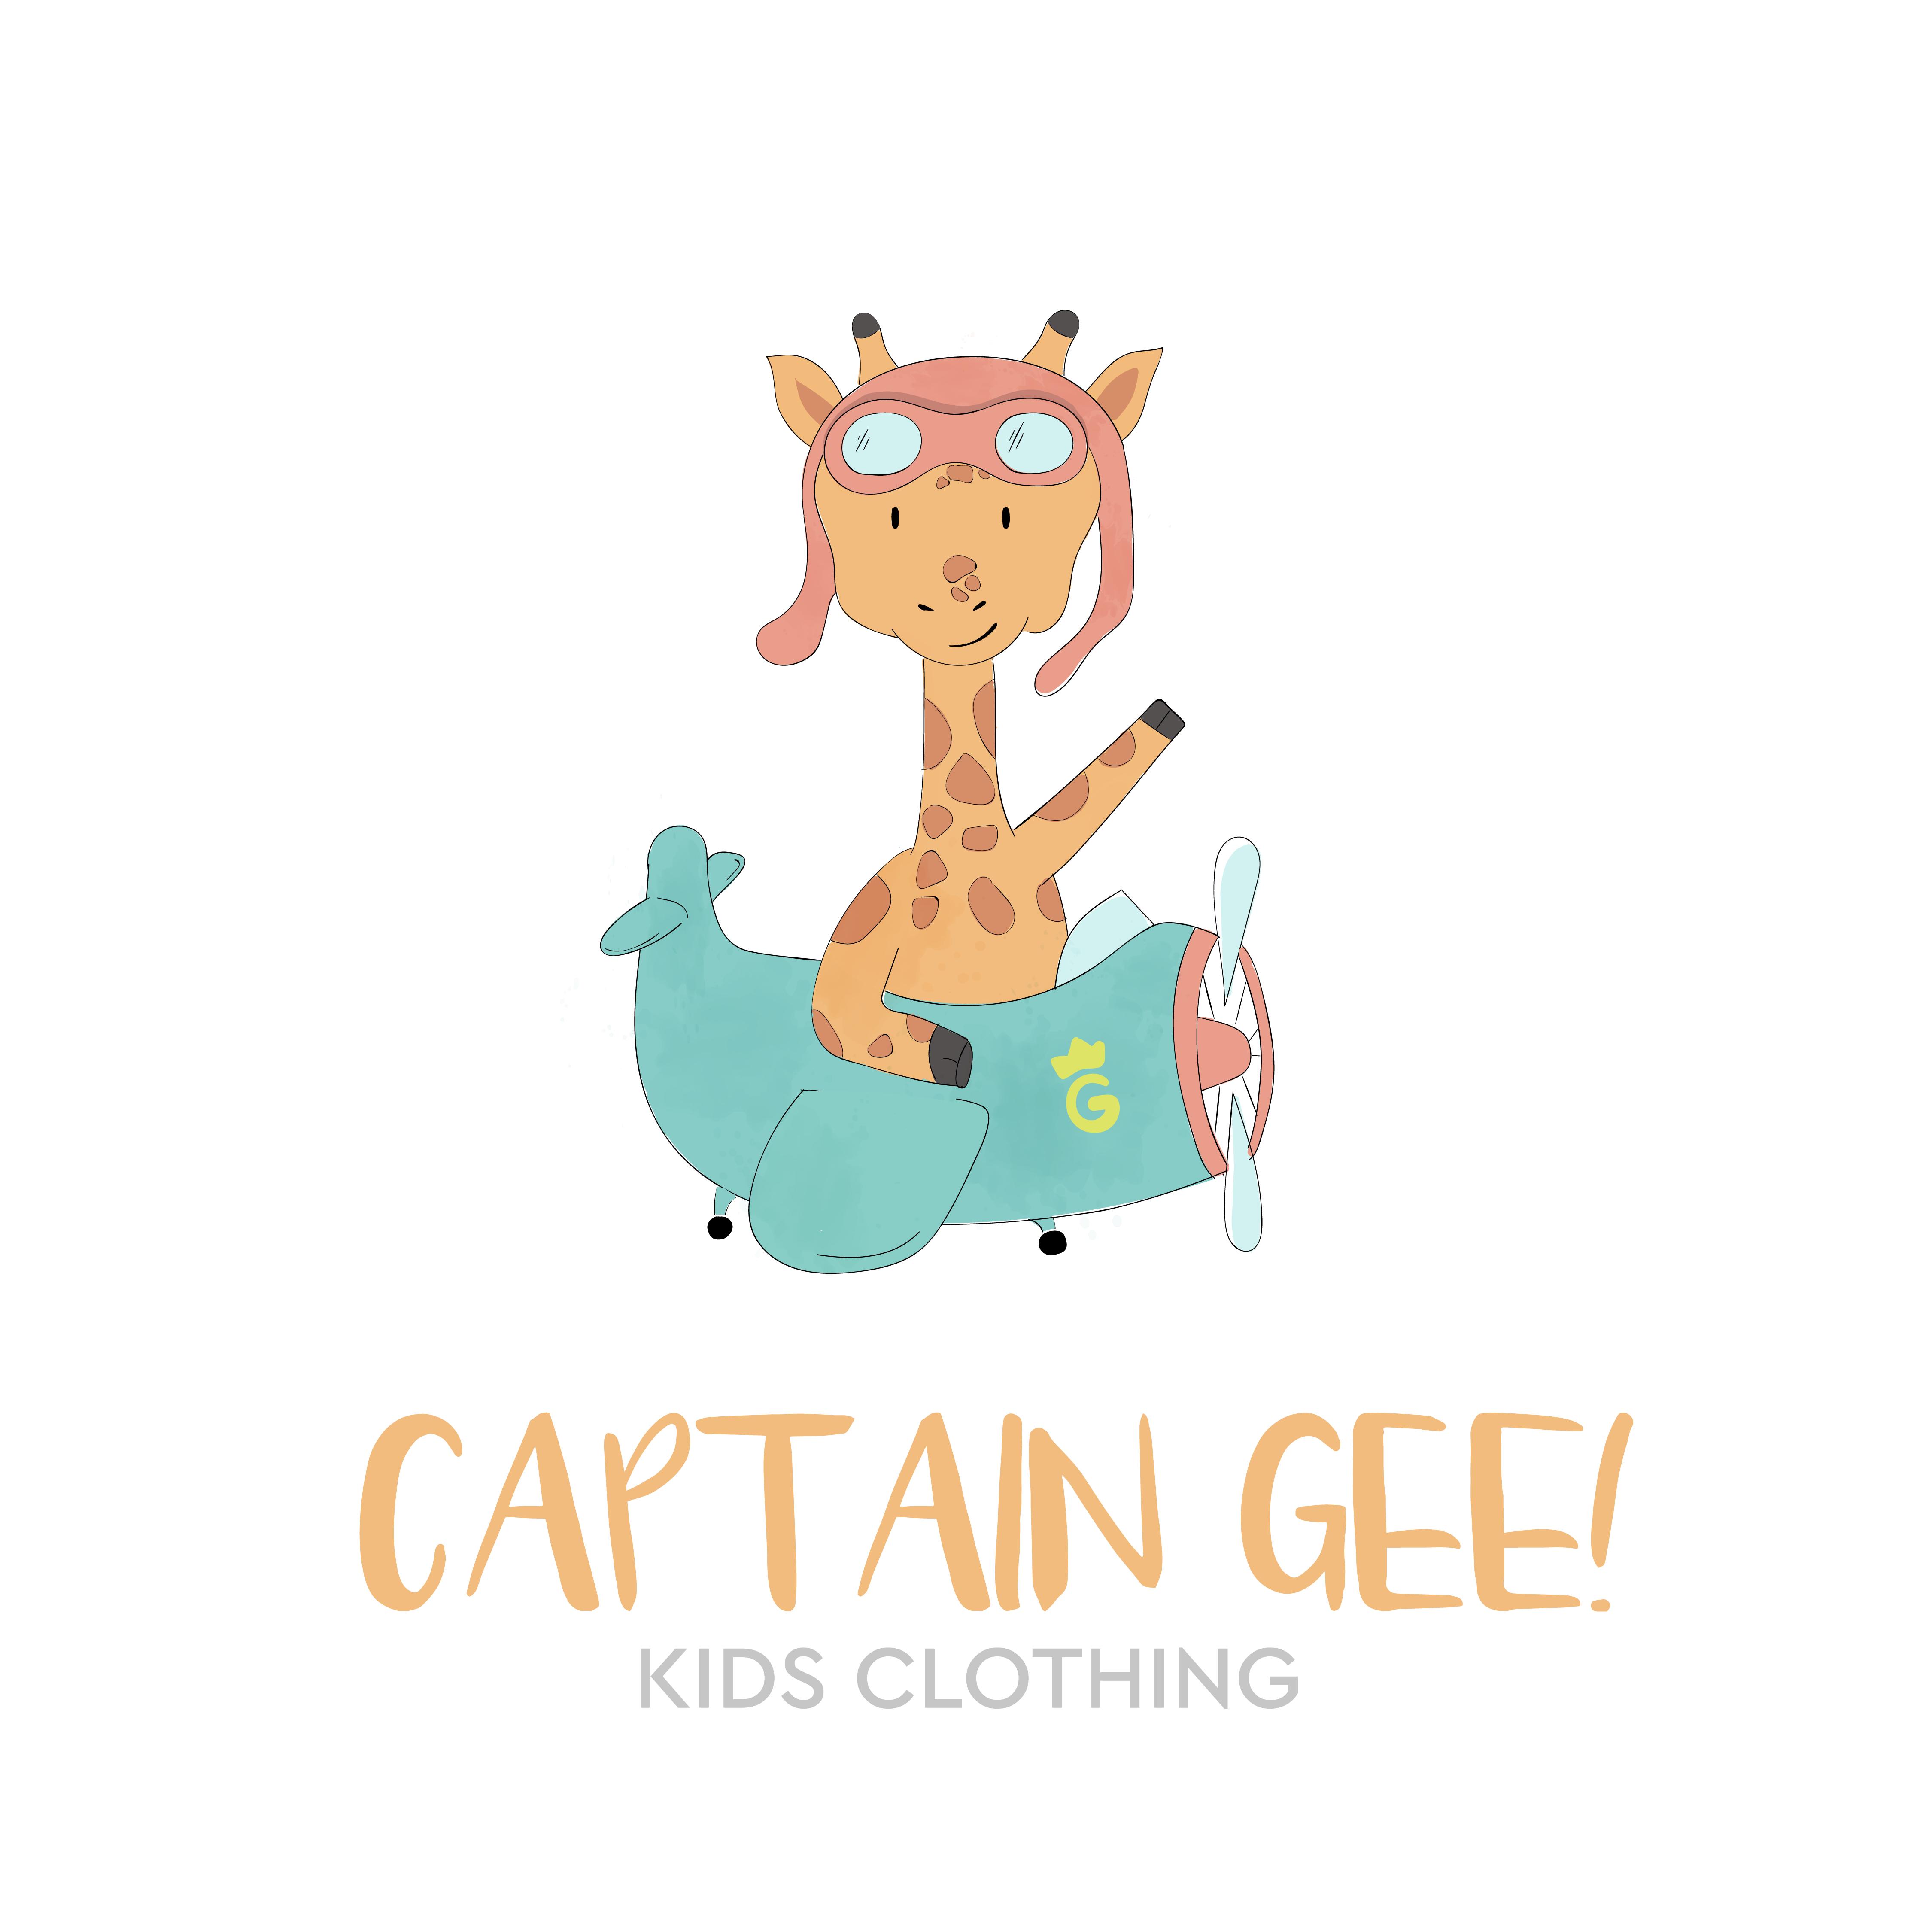 CaptGee